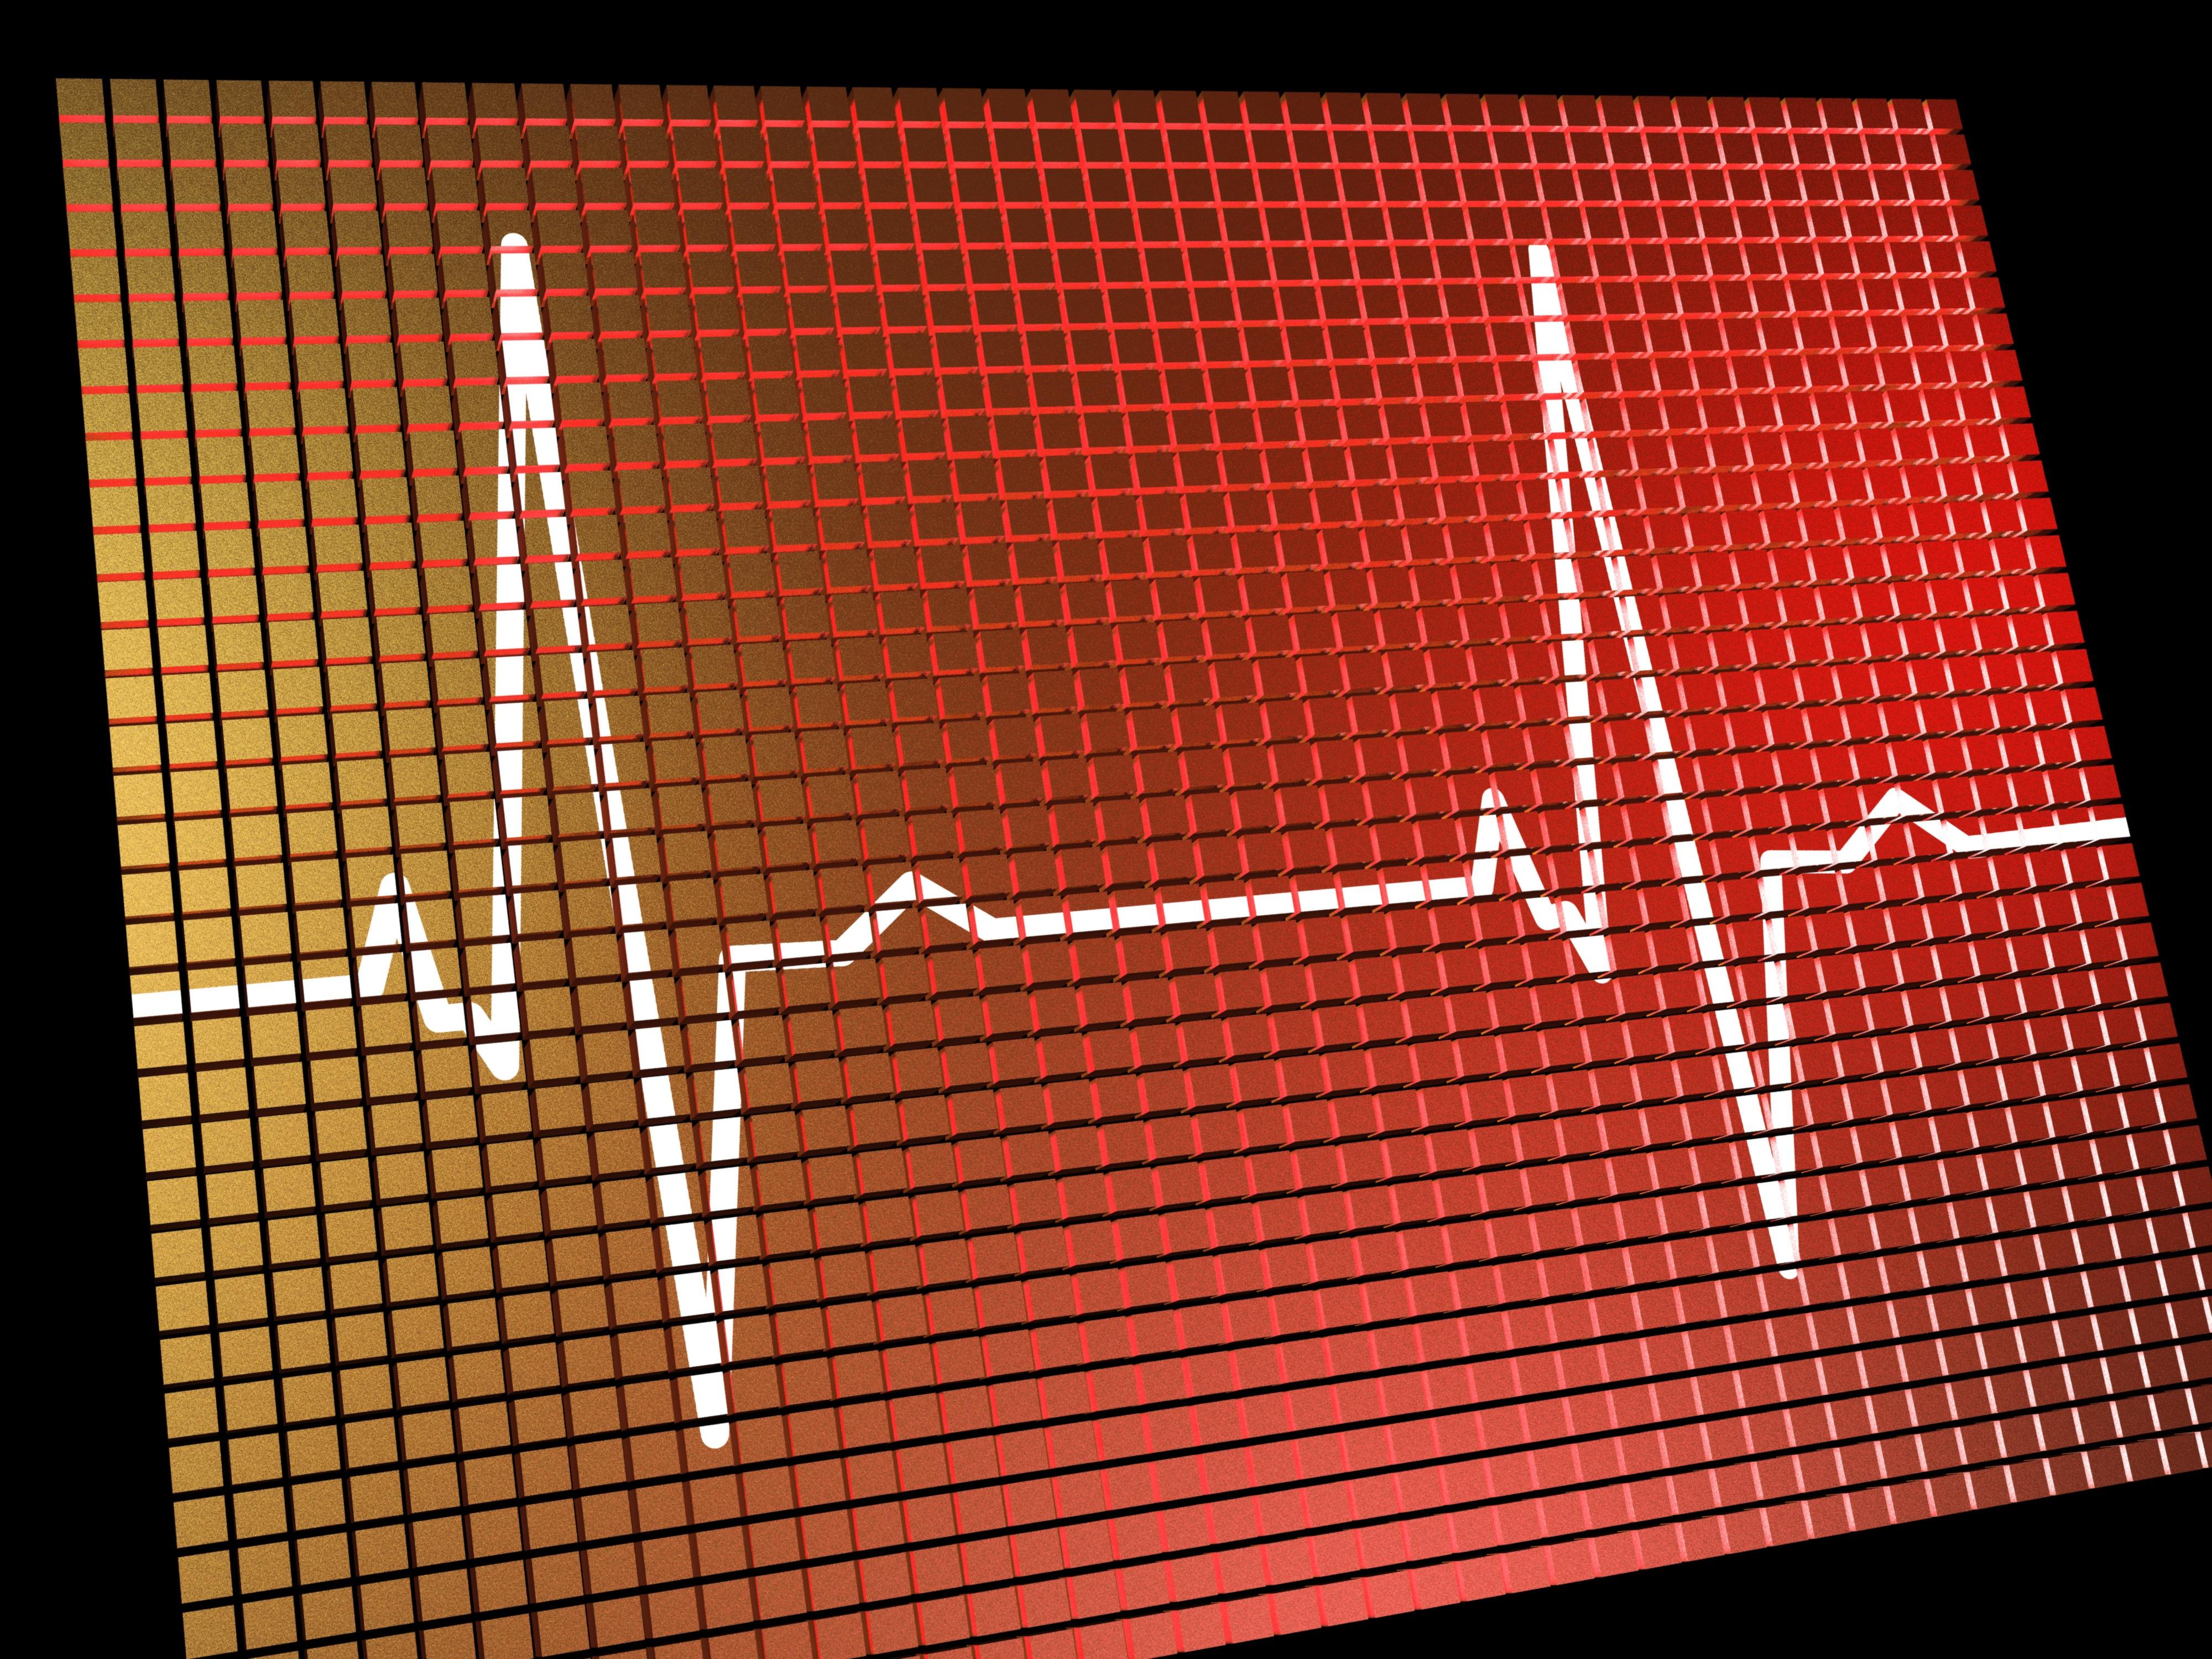 heart-rate-monitor-showing-cardiac-and-coronary-health_GyHHJMP_